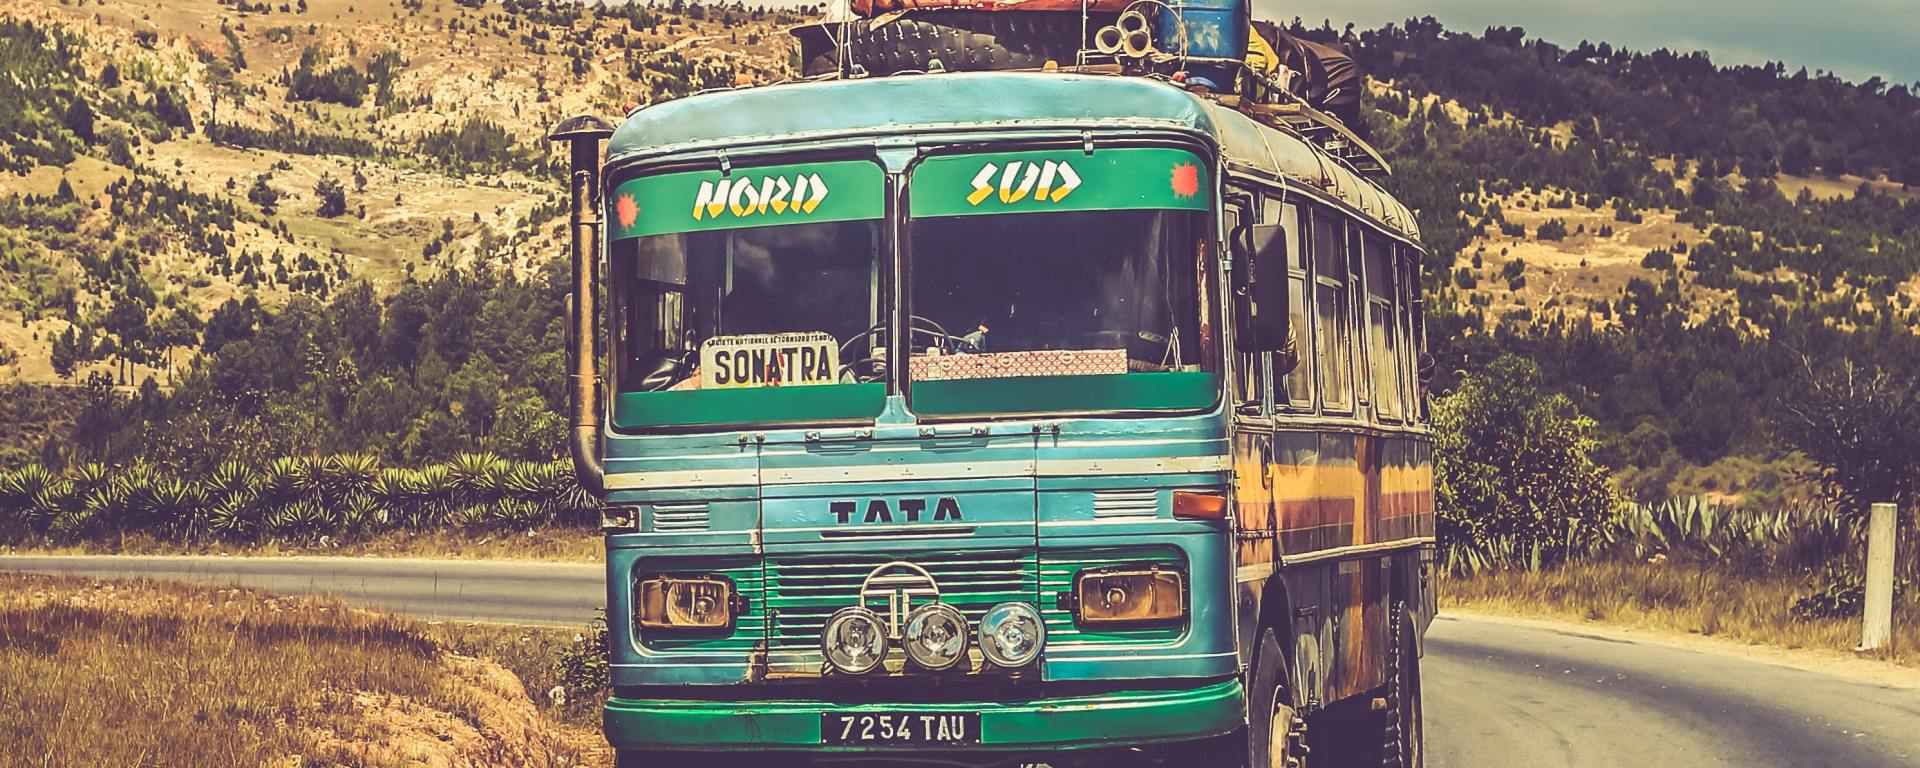 Autobús viejo, por la carretera de un paisaje agreste